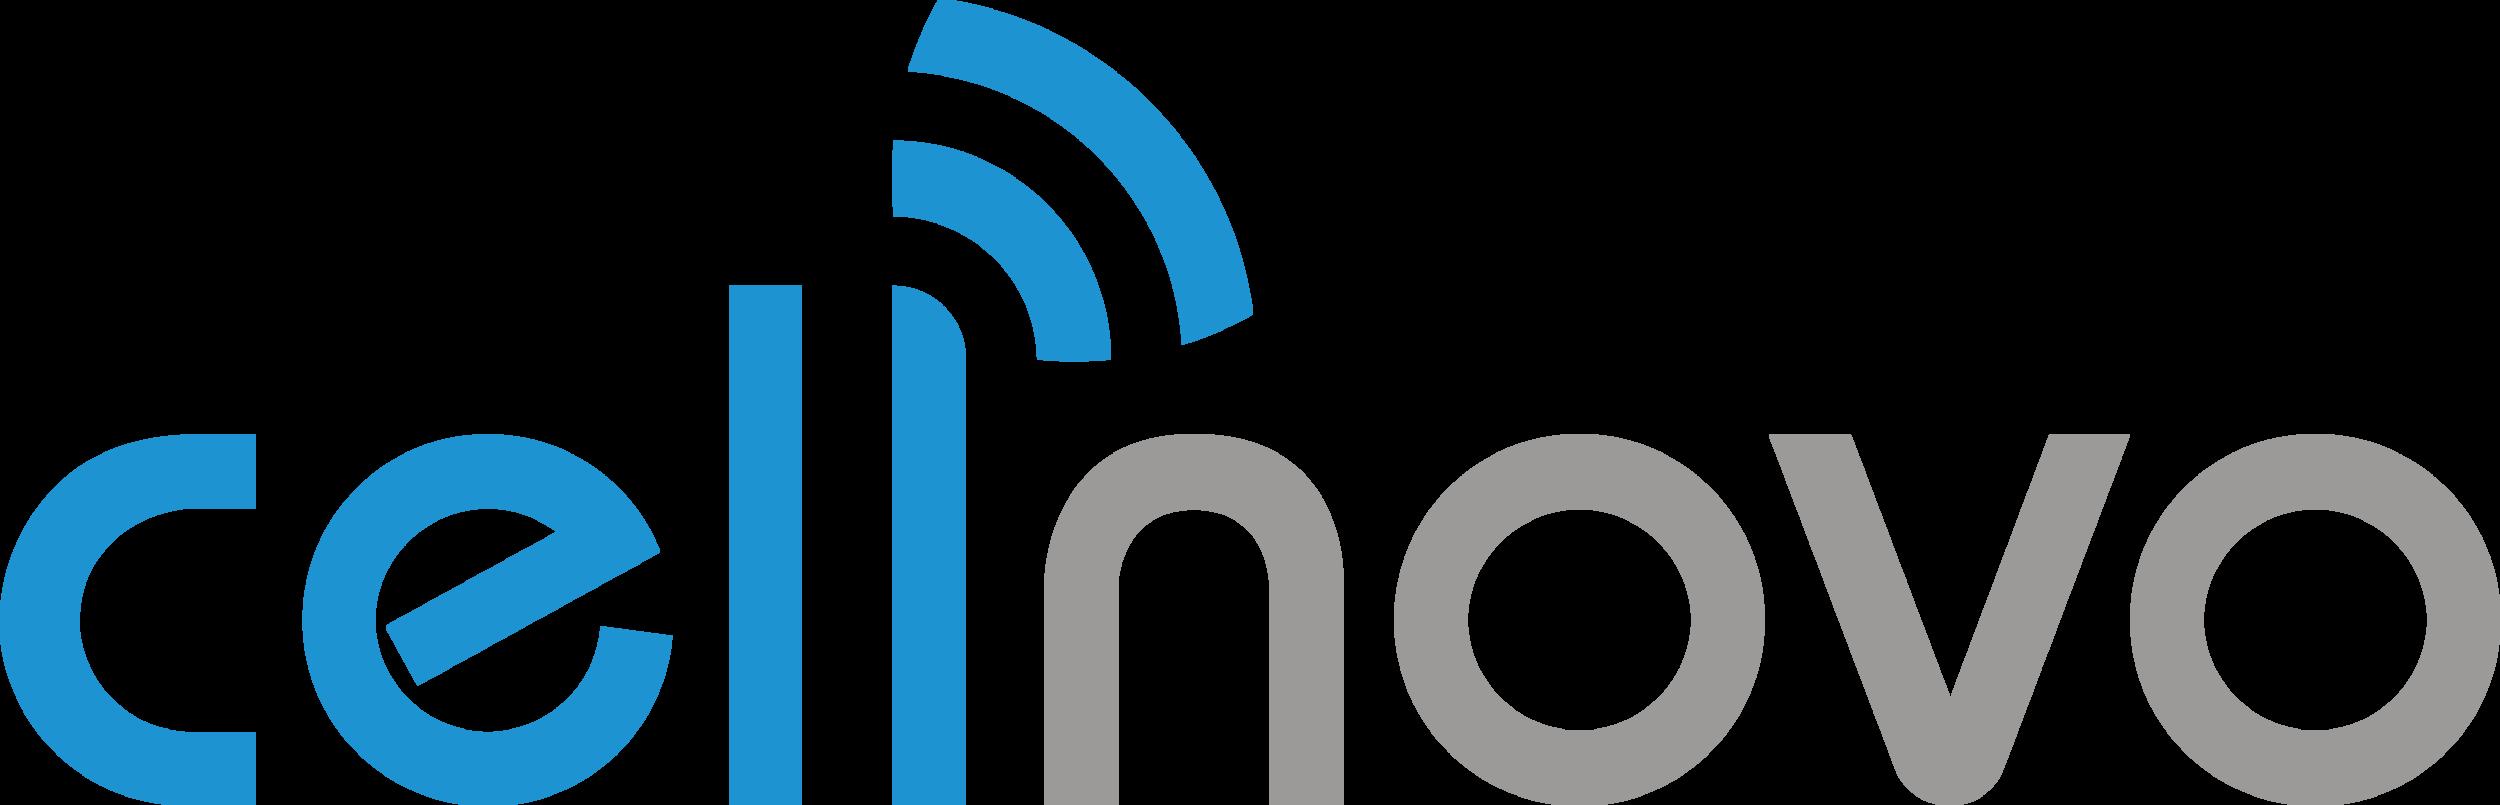 Cellnovo-logo.png